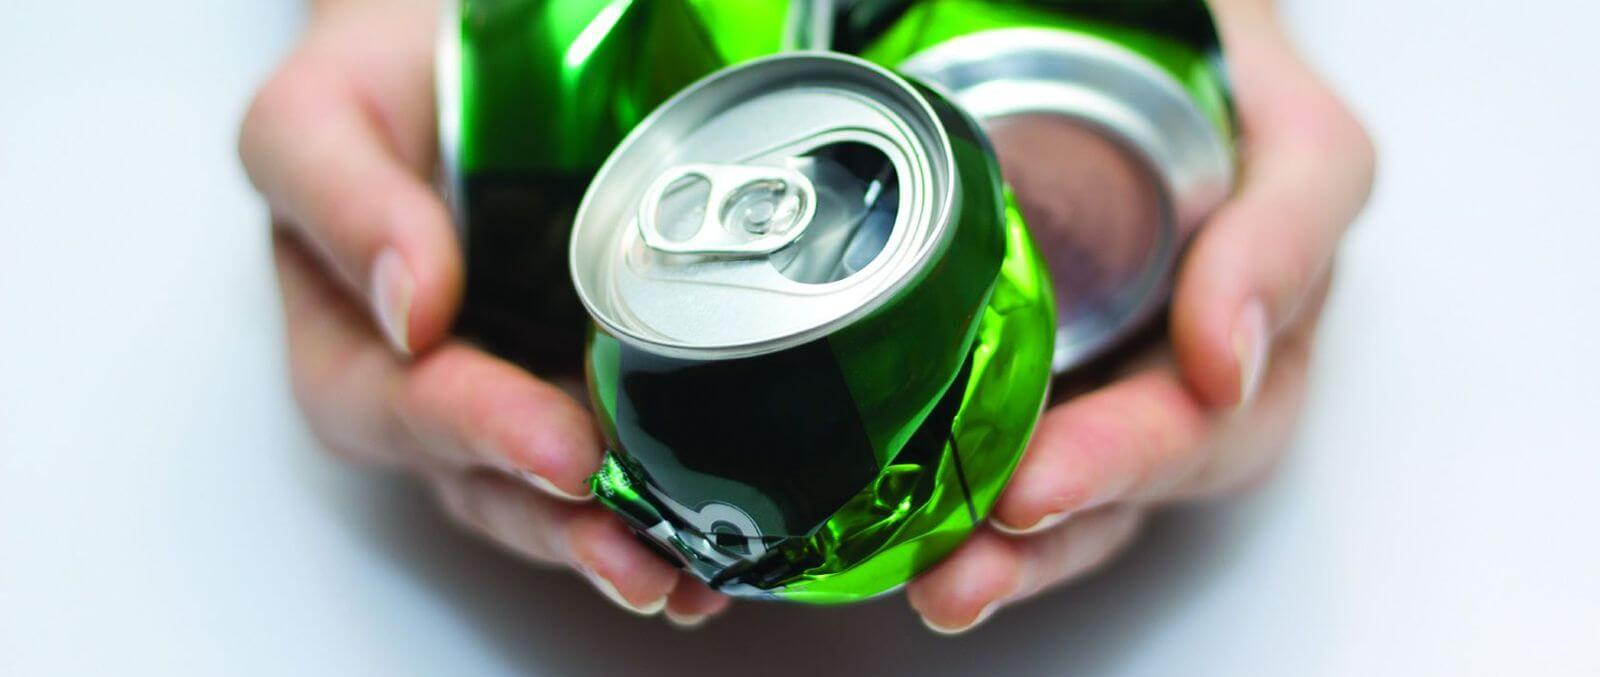 Reciclar la basura cooperativa del sur